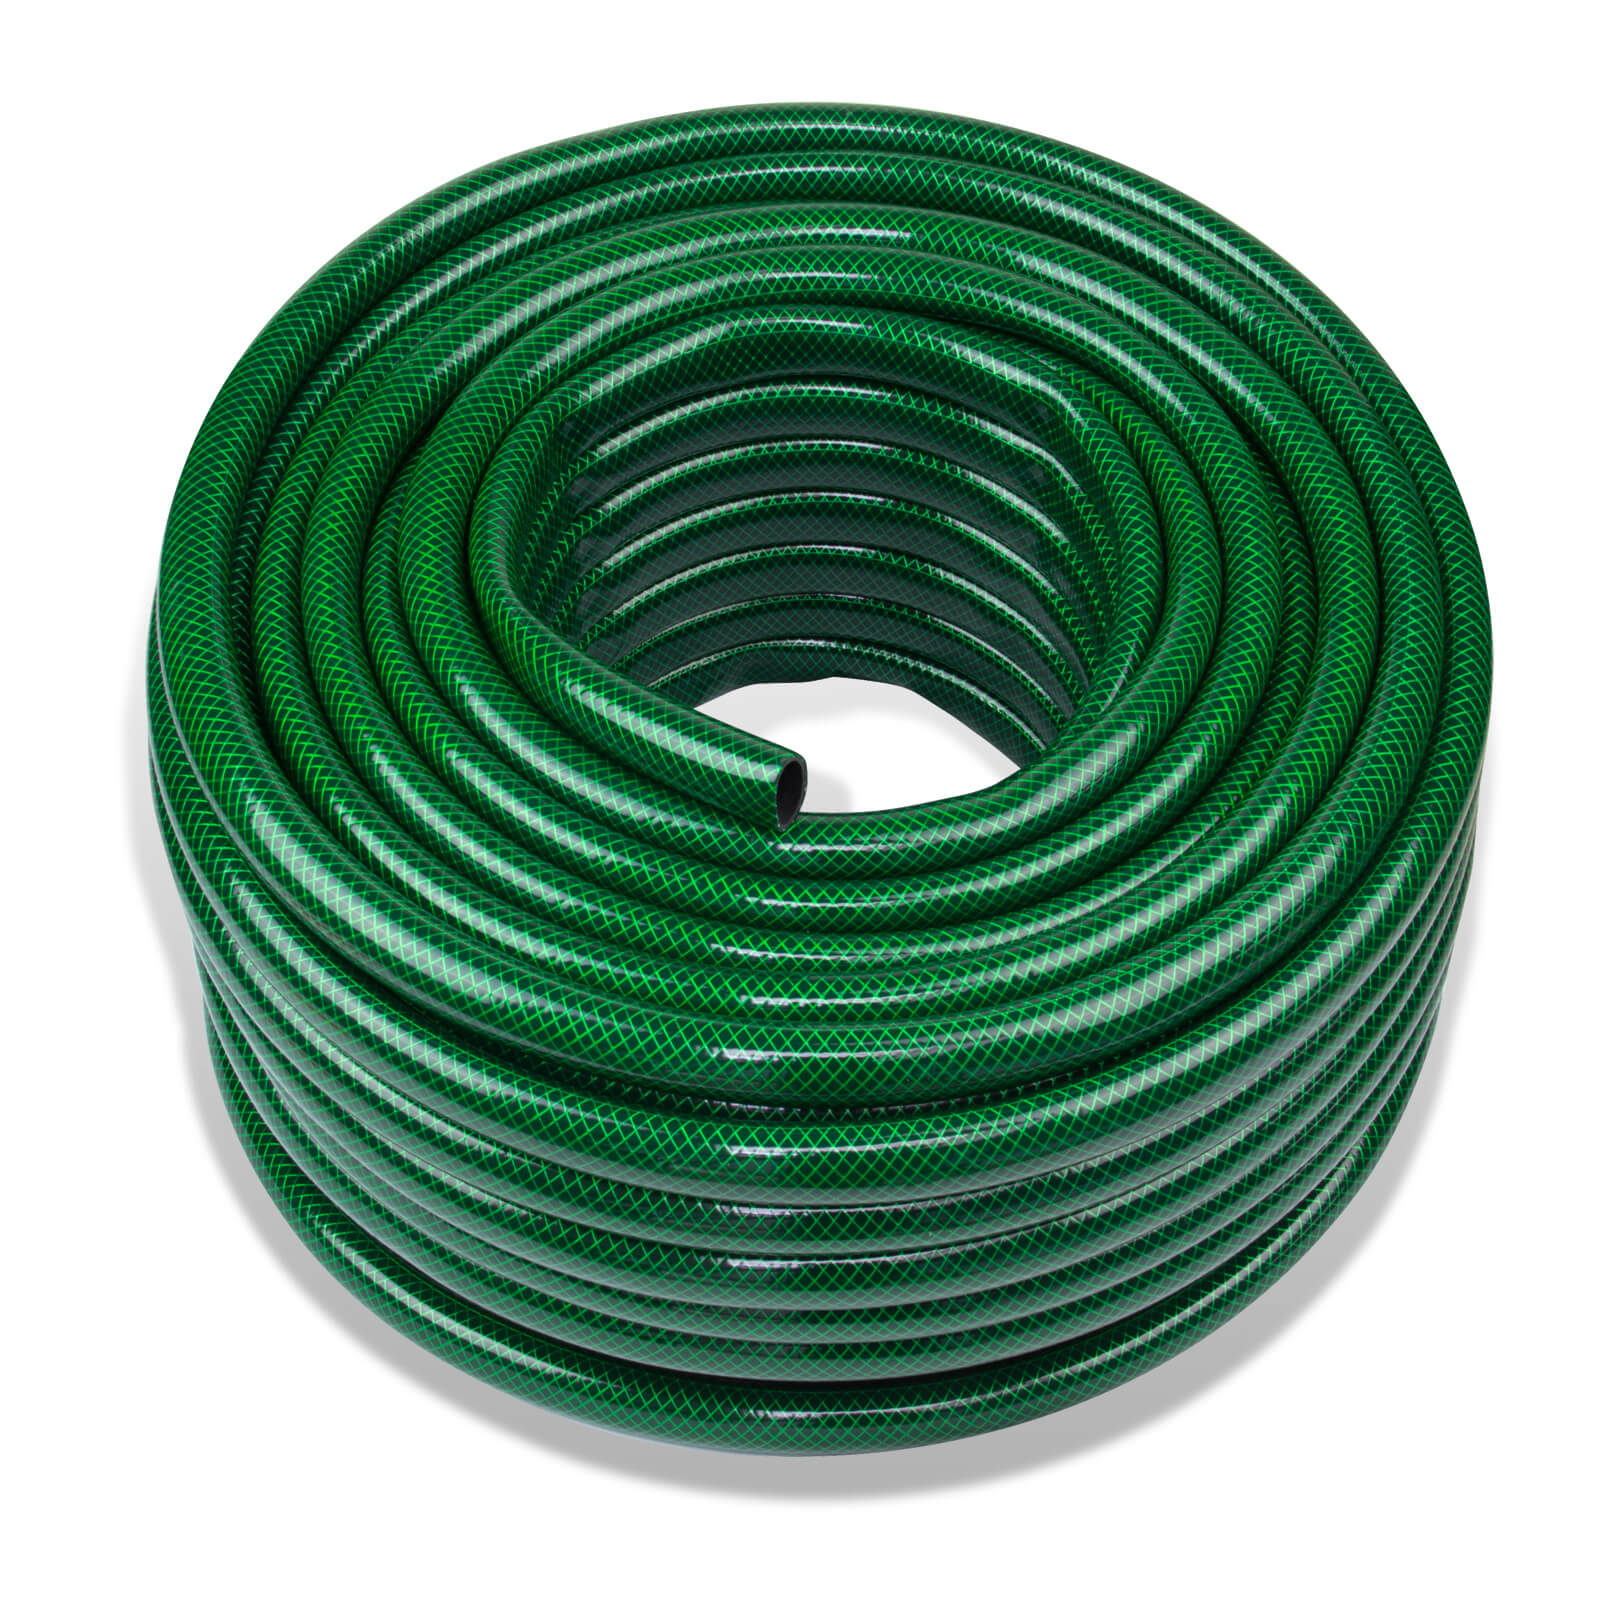 Stabilo-Sanitaer Gartenschlauch / PVC Wasserschlauch 3/4 Zoll - 50 m - grün - 3-lagig